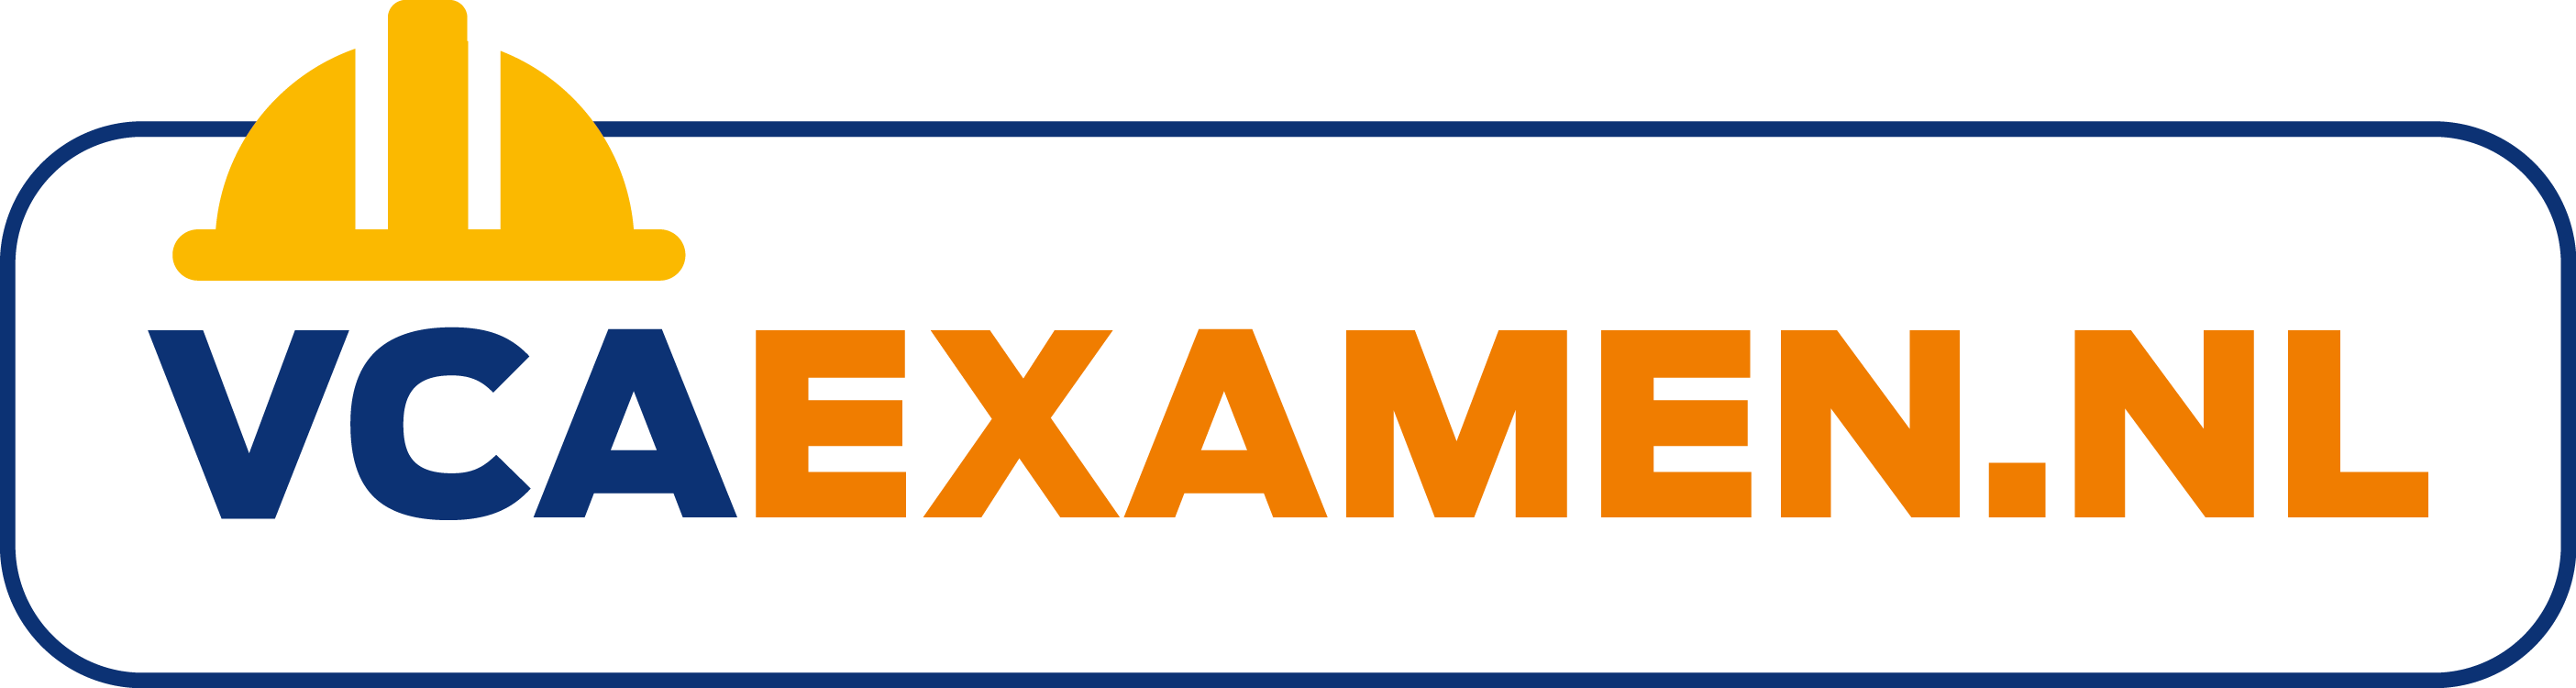 Logo VCA examen FC